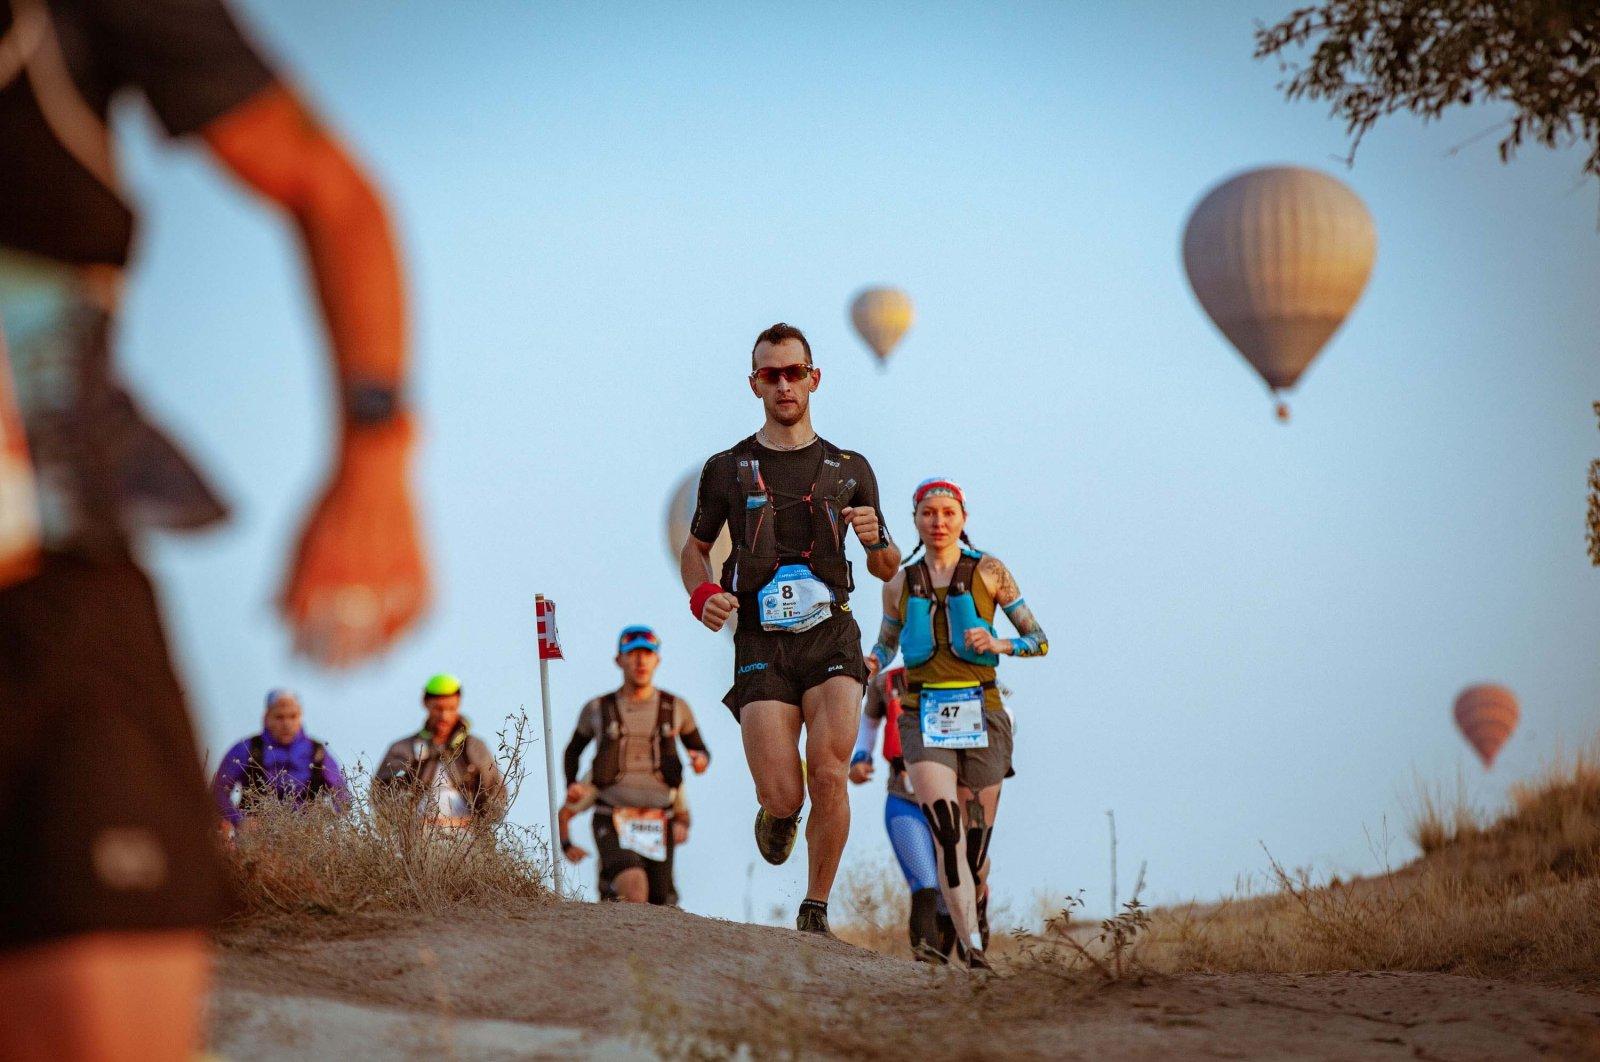 Athletes compete in the Salomon Cappadocia Ultra-Trail held in Nevşehir, Turkey, Oct. 19, 2019. (IHA Photo)